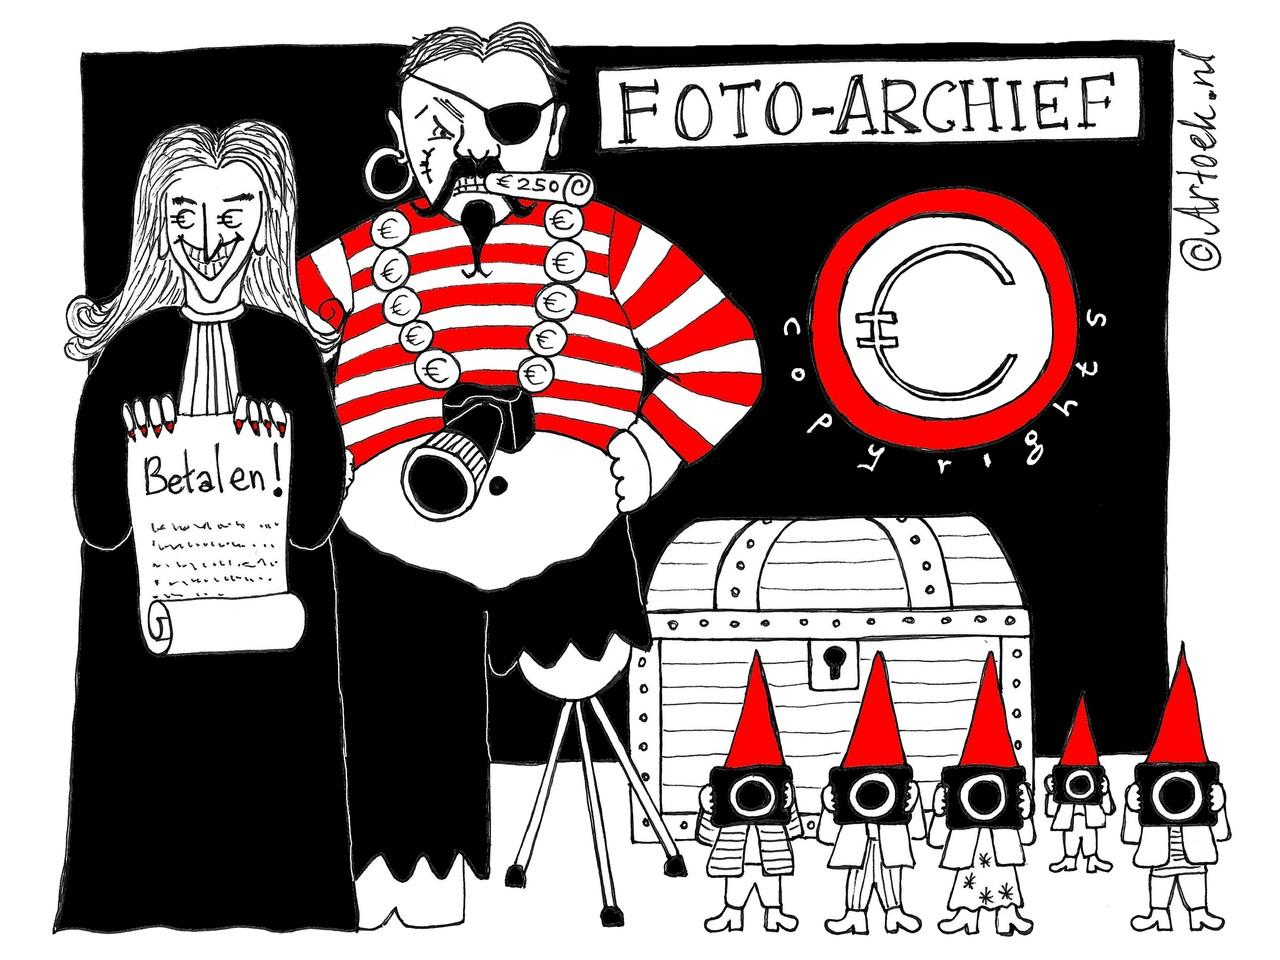 Actie tegen overdreven fotoclaims